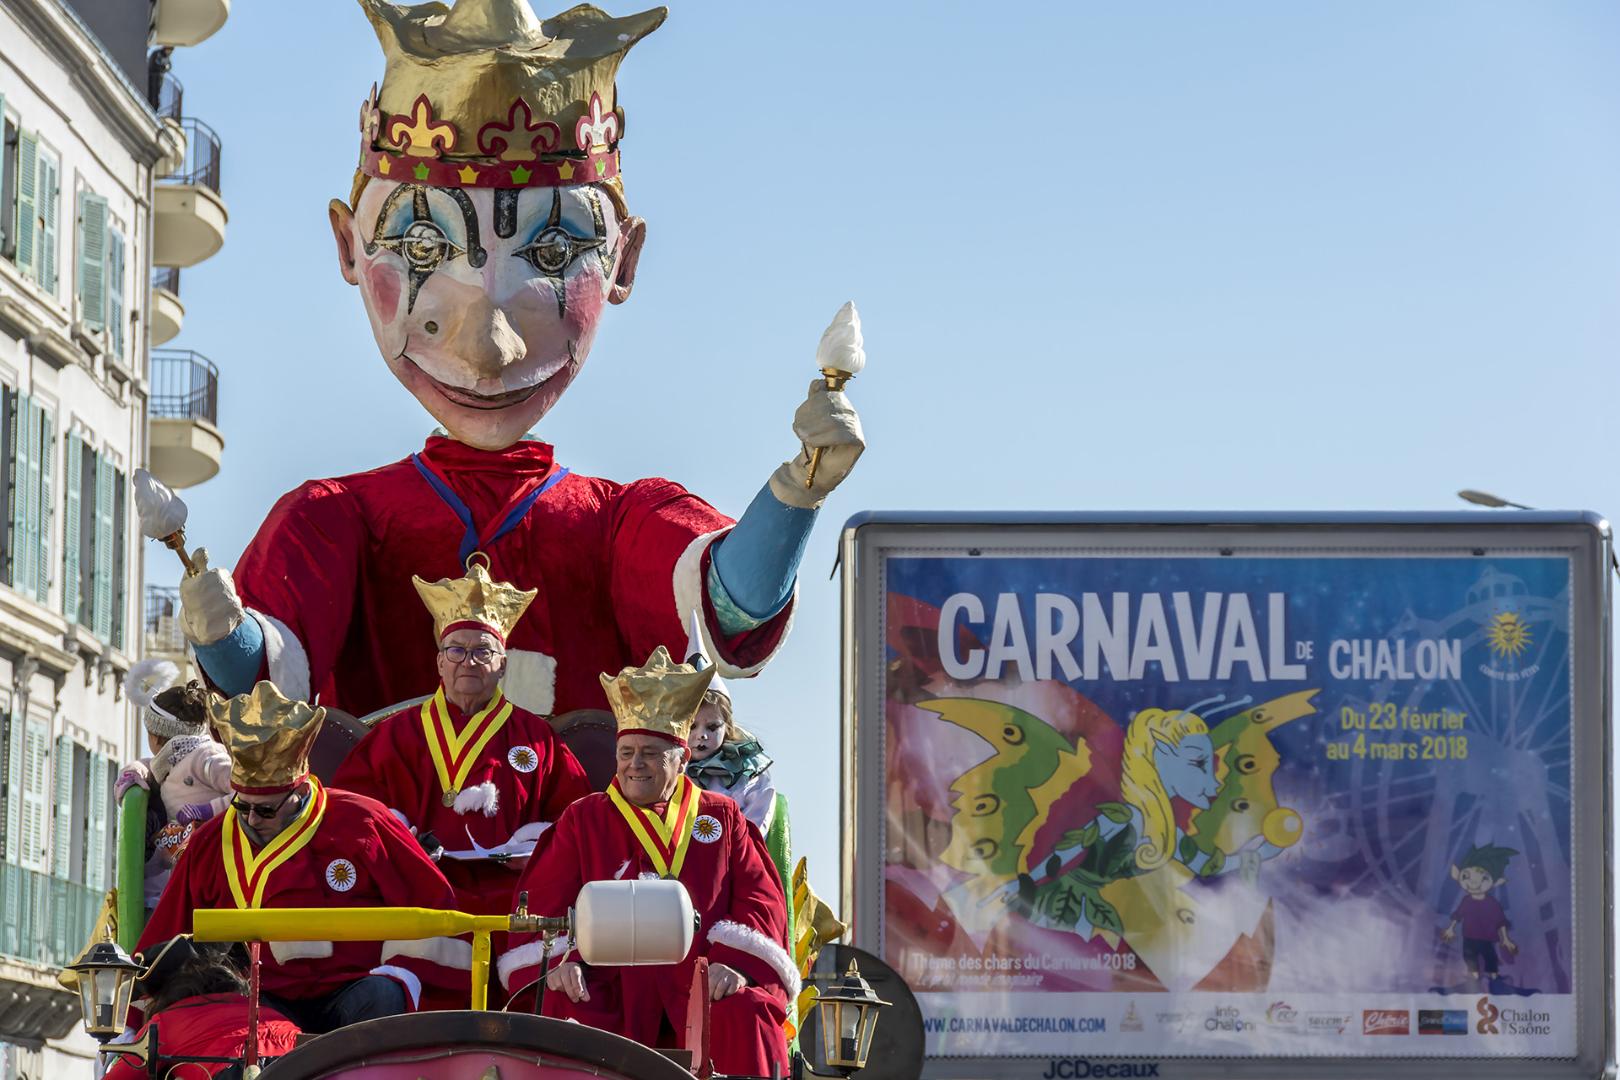 carnaval2019-10 (2021_02_07 10_18_26 UTC)